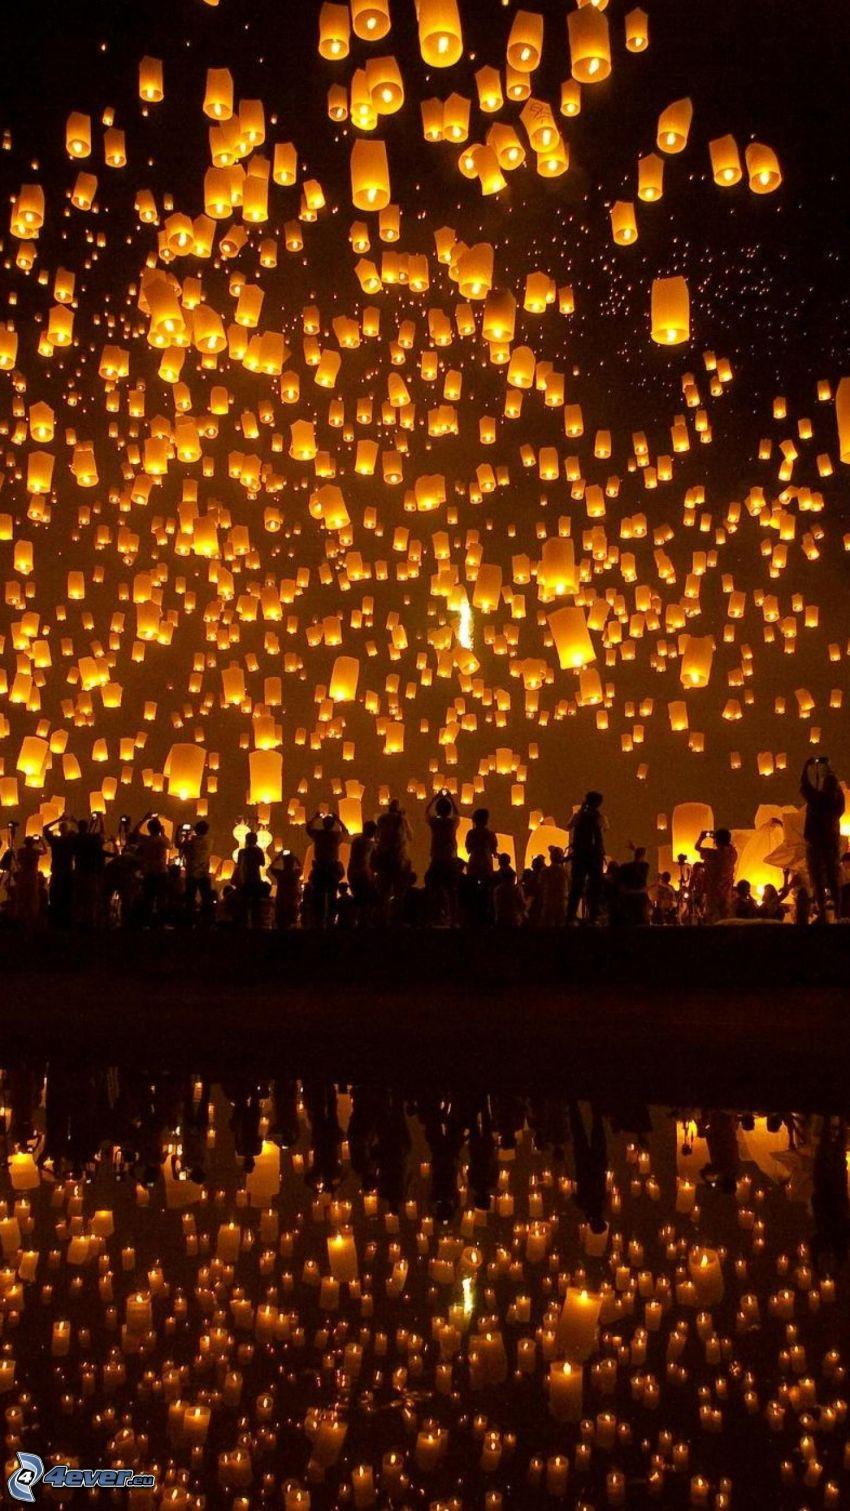 lanterne fortuna, sagome di persone, riflessione